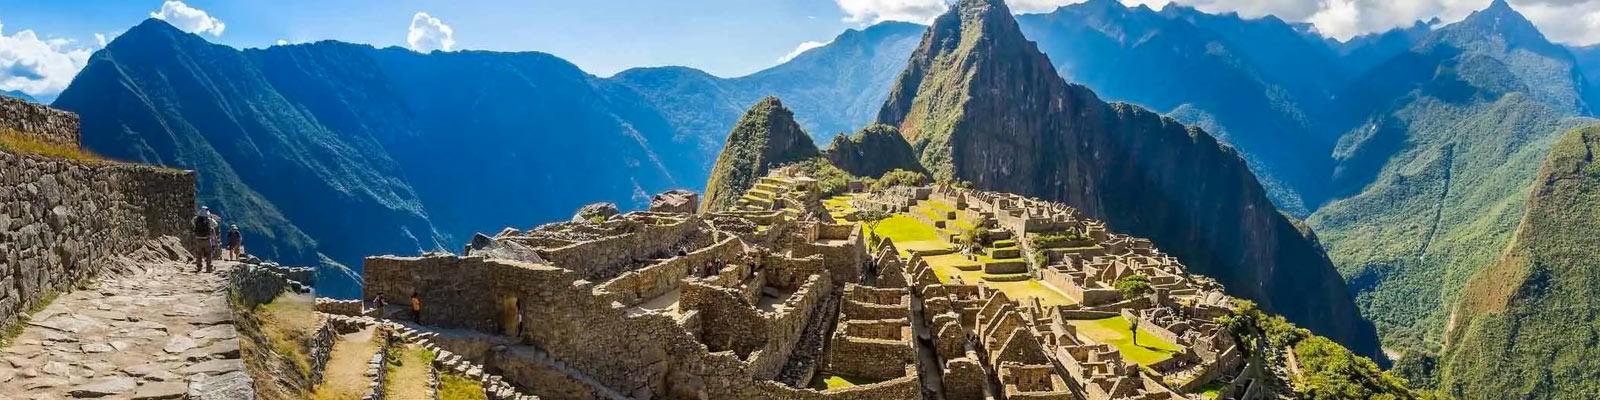 Magical Cusco 5 Days / 4 Nights